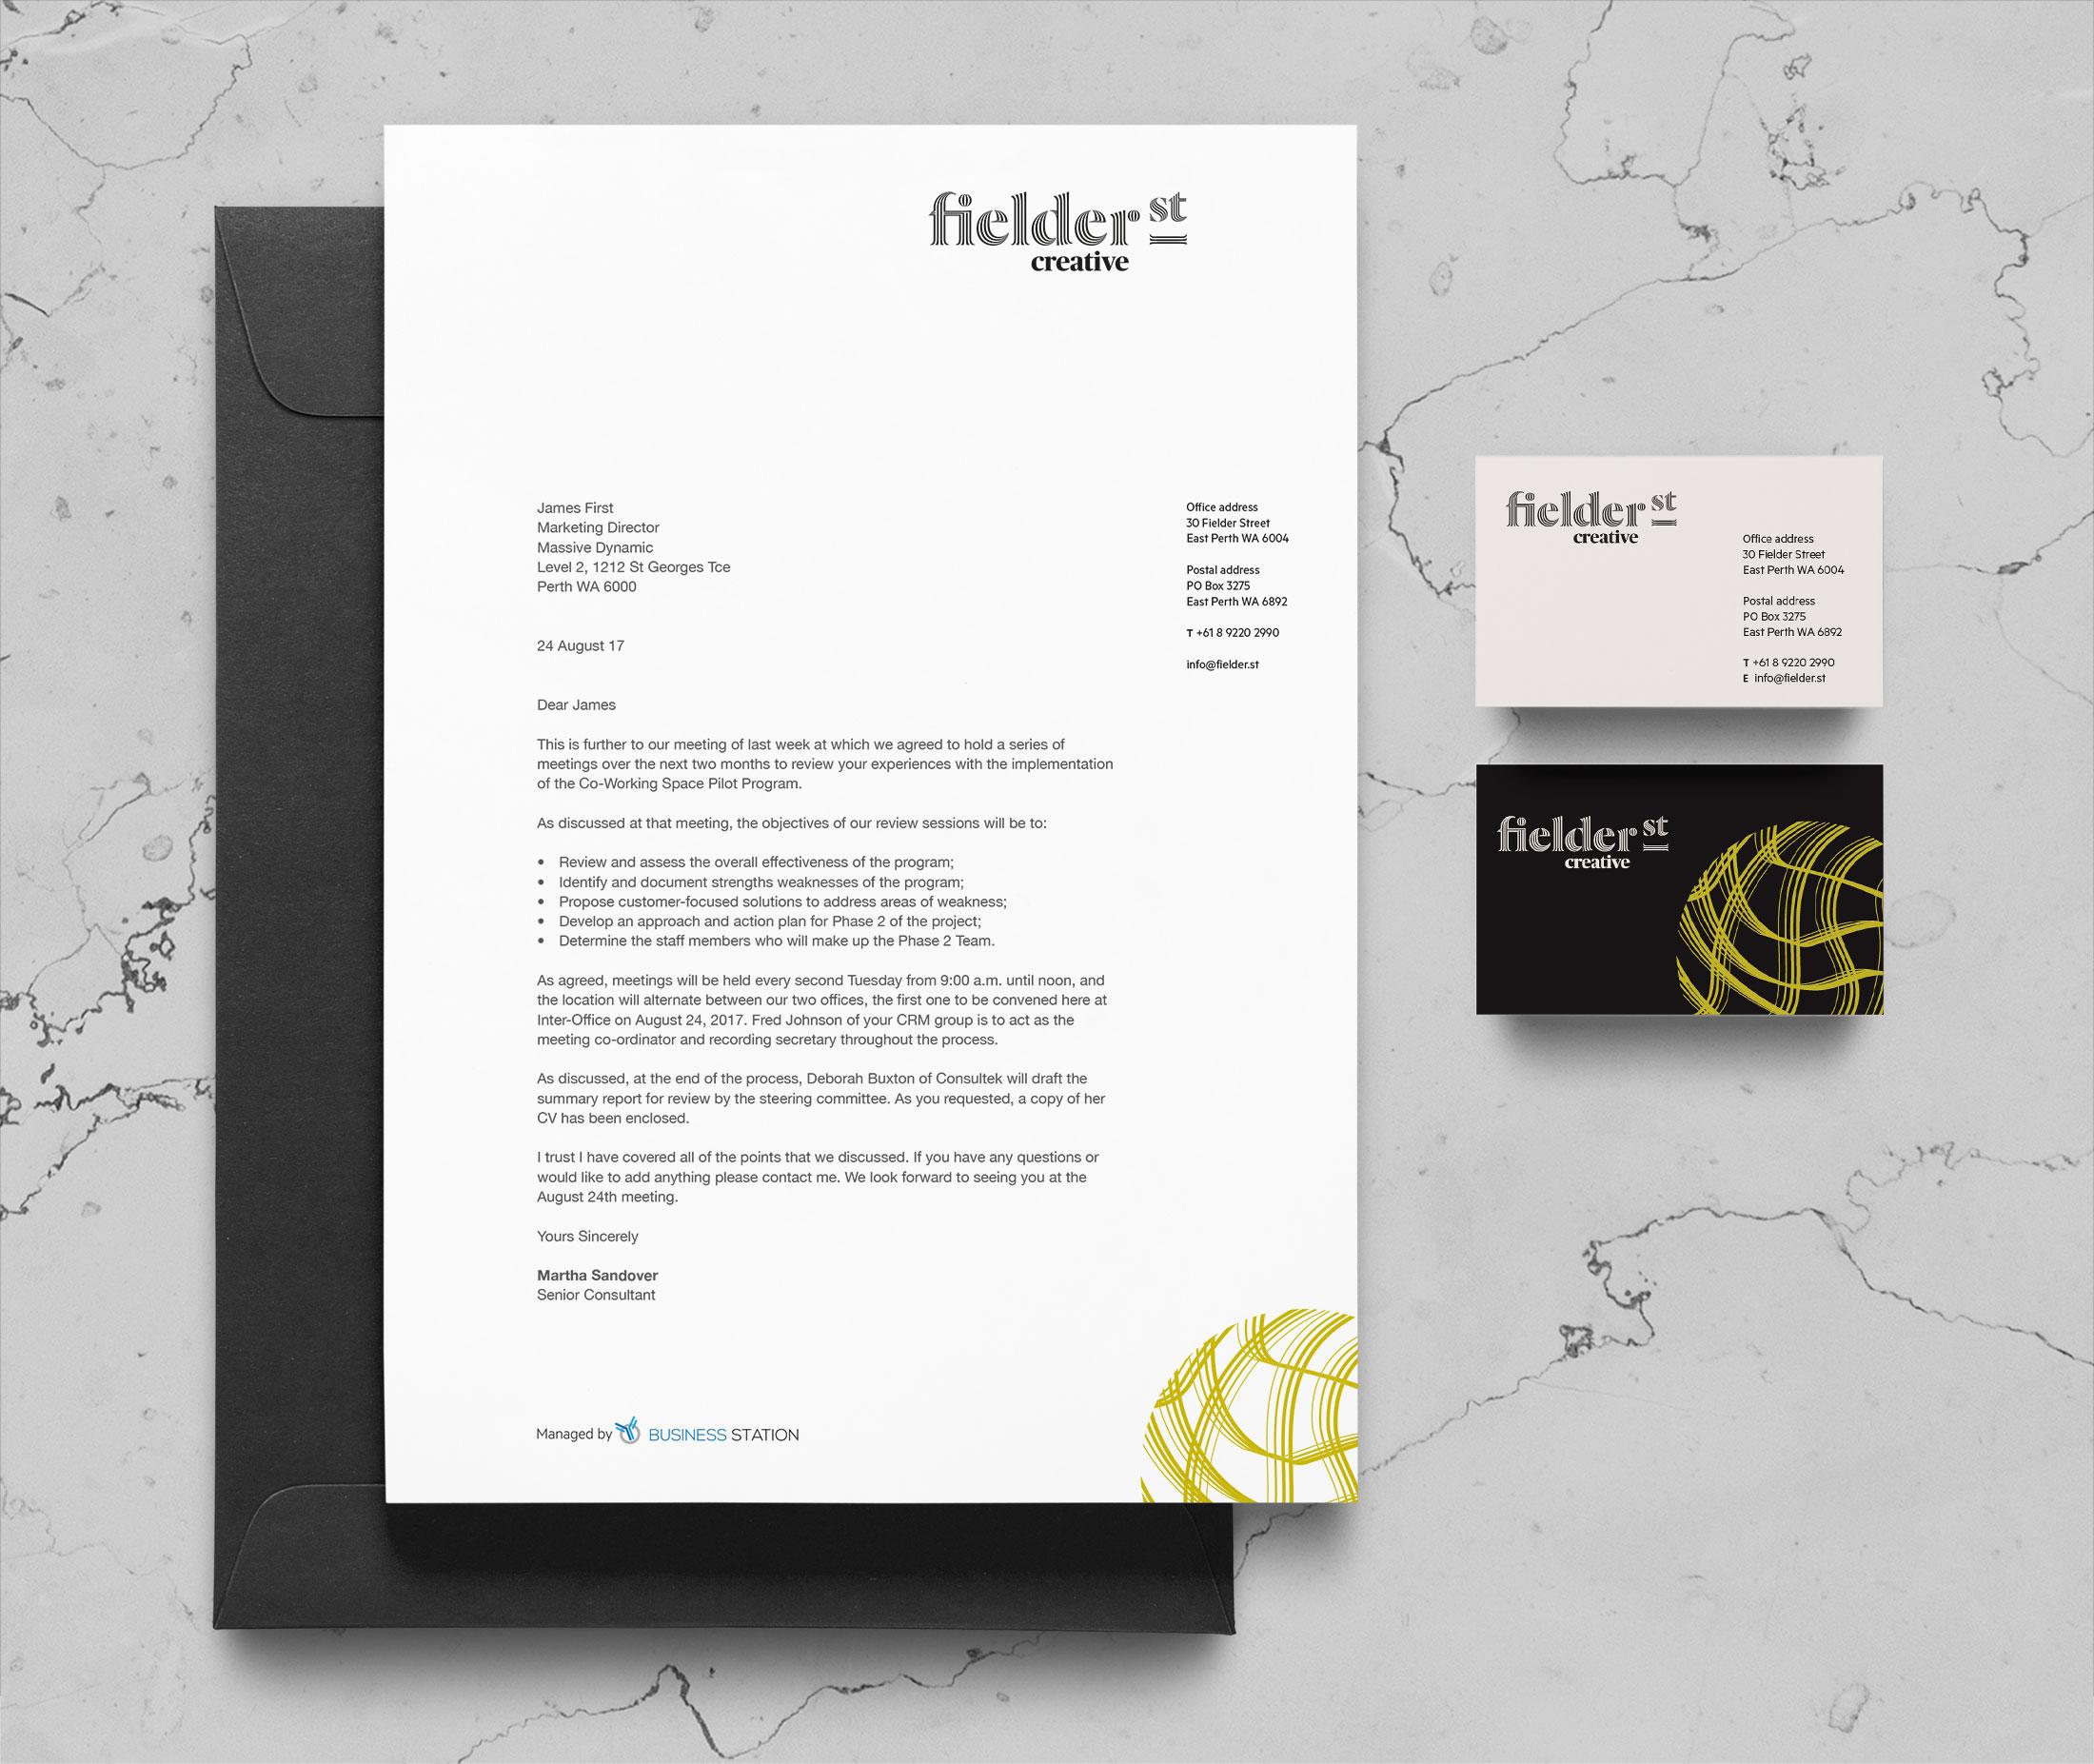 Fielder Street Creative – Stationery